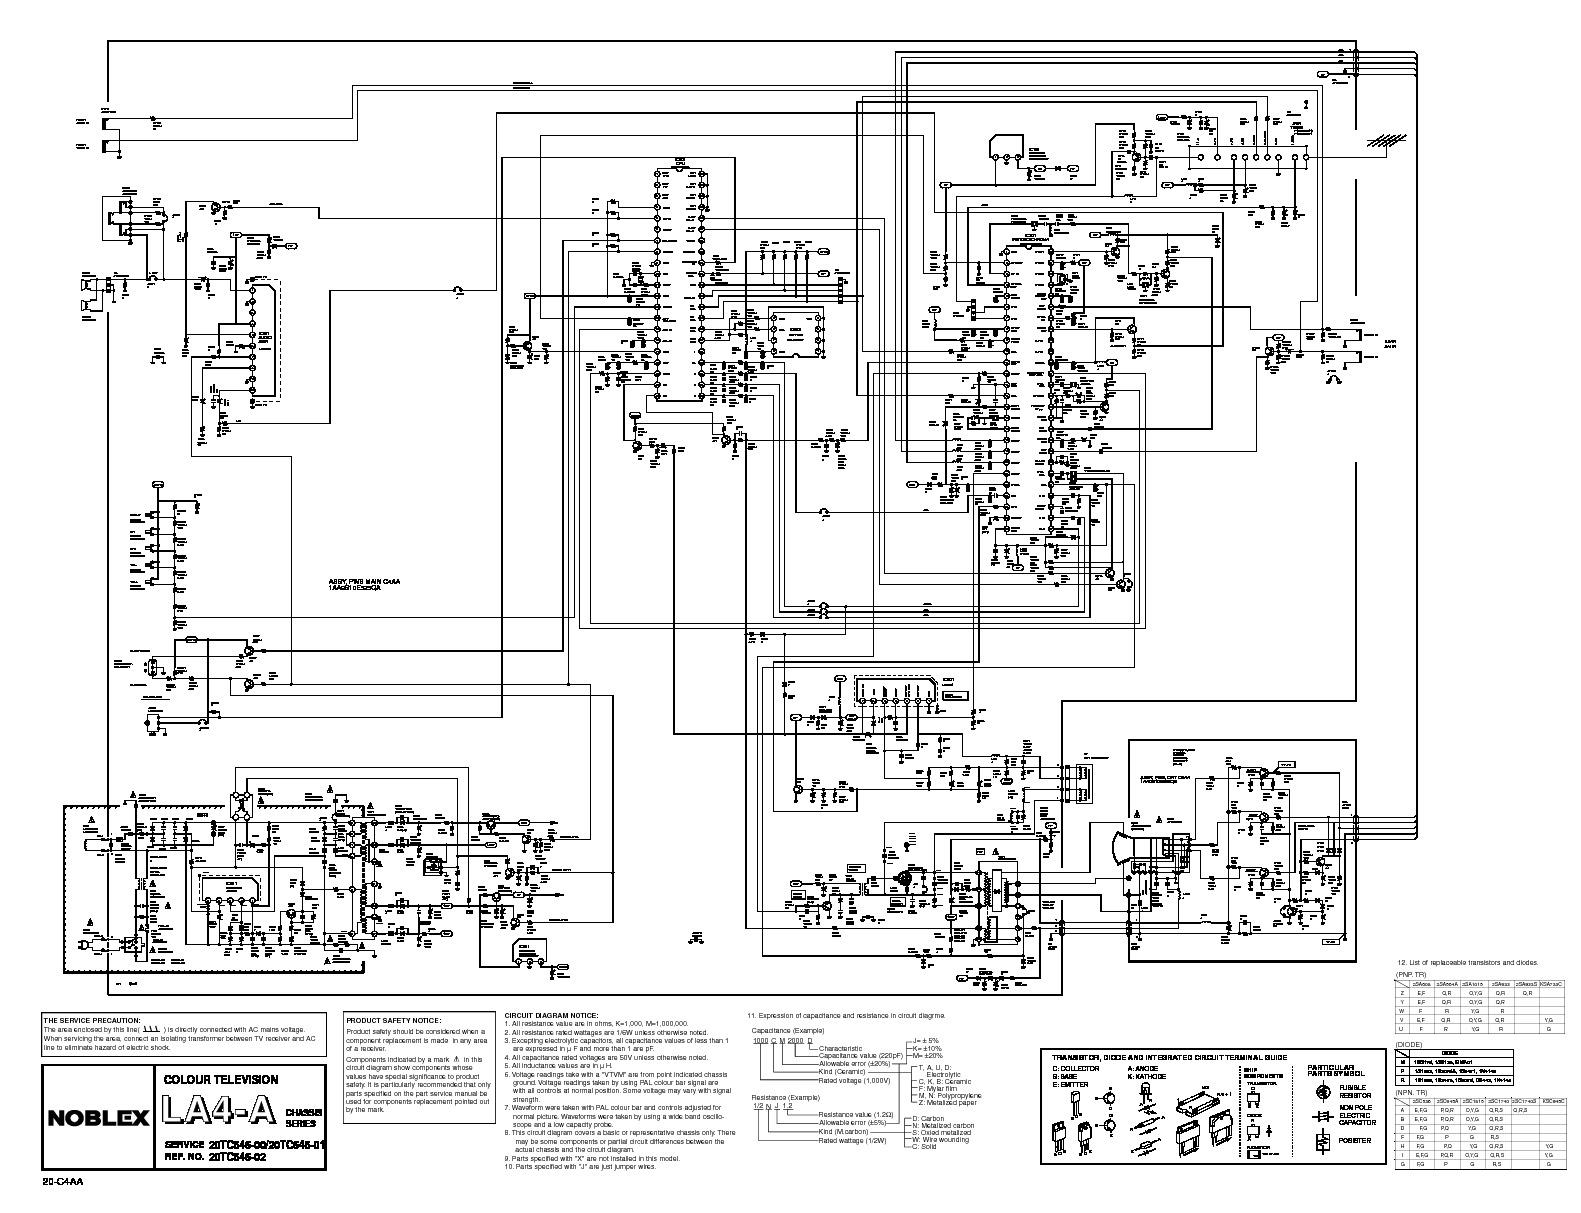 SANYO ESQUEMA Sanyo C20LB94M LA 4A pdf Diagramas de